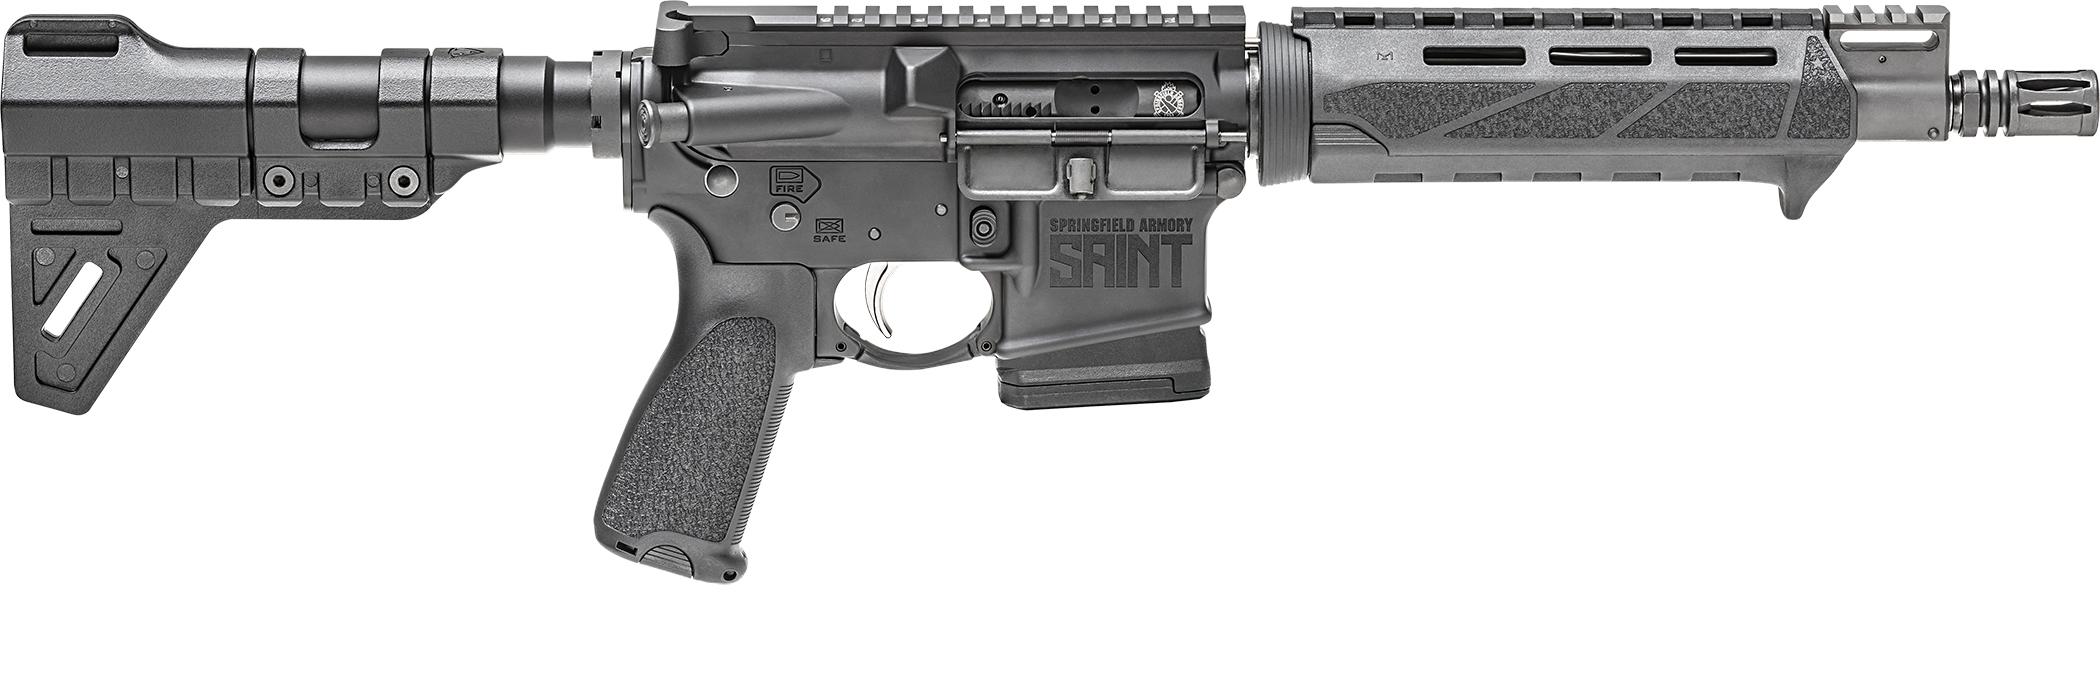 Springfield Armory Saint Pistol 223 Rem | 5.56 NATO